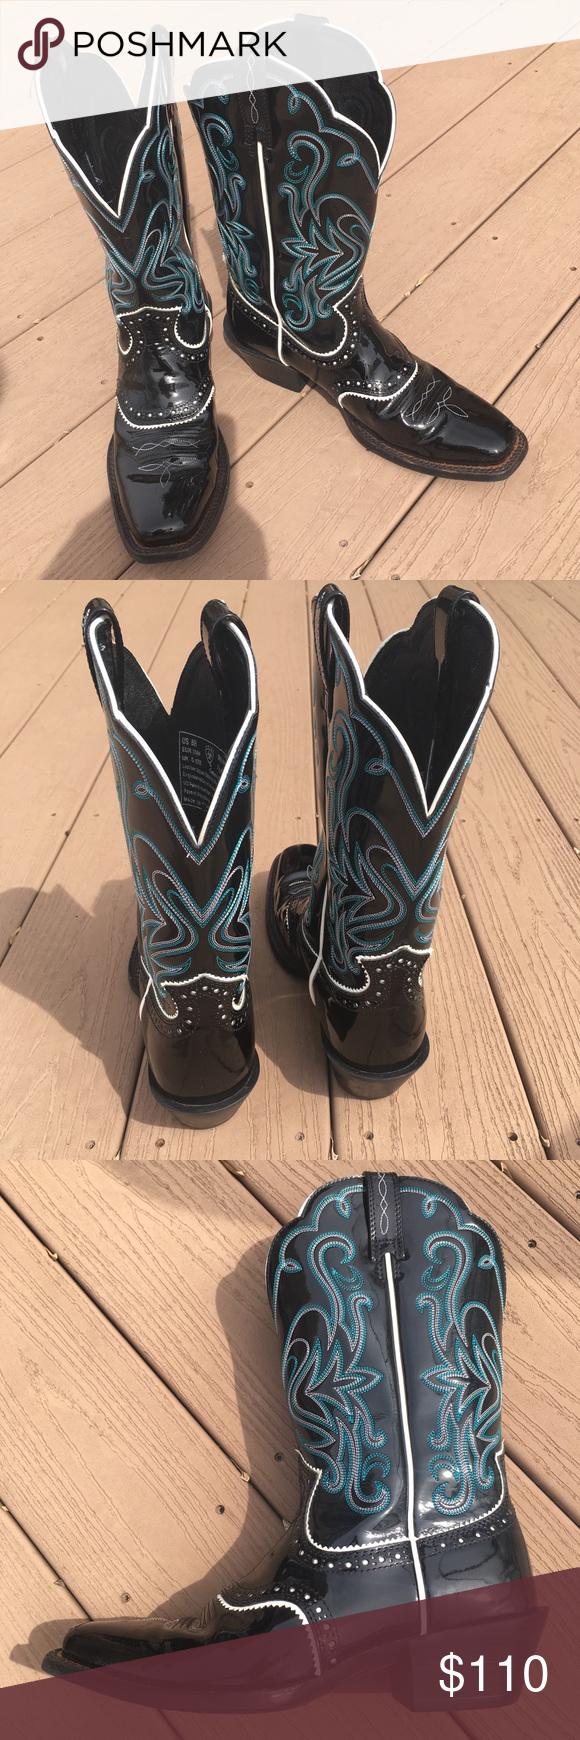 be8624304b4 Ariat Patent Leather Women's Cowboy Boots   My Posh Picks   Fashion ...